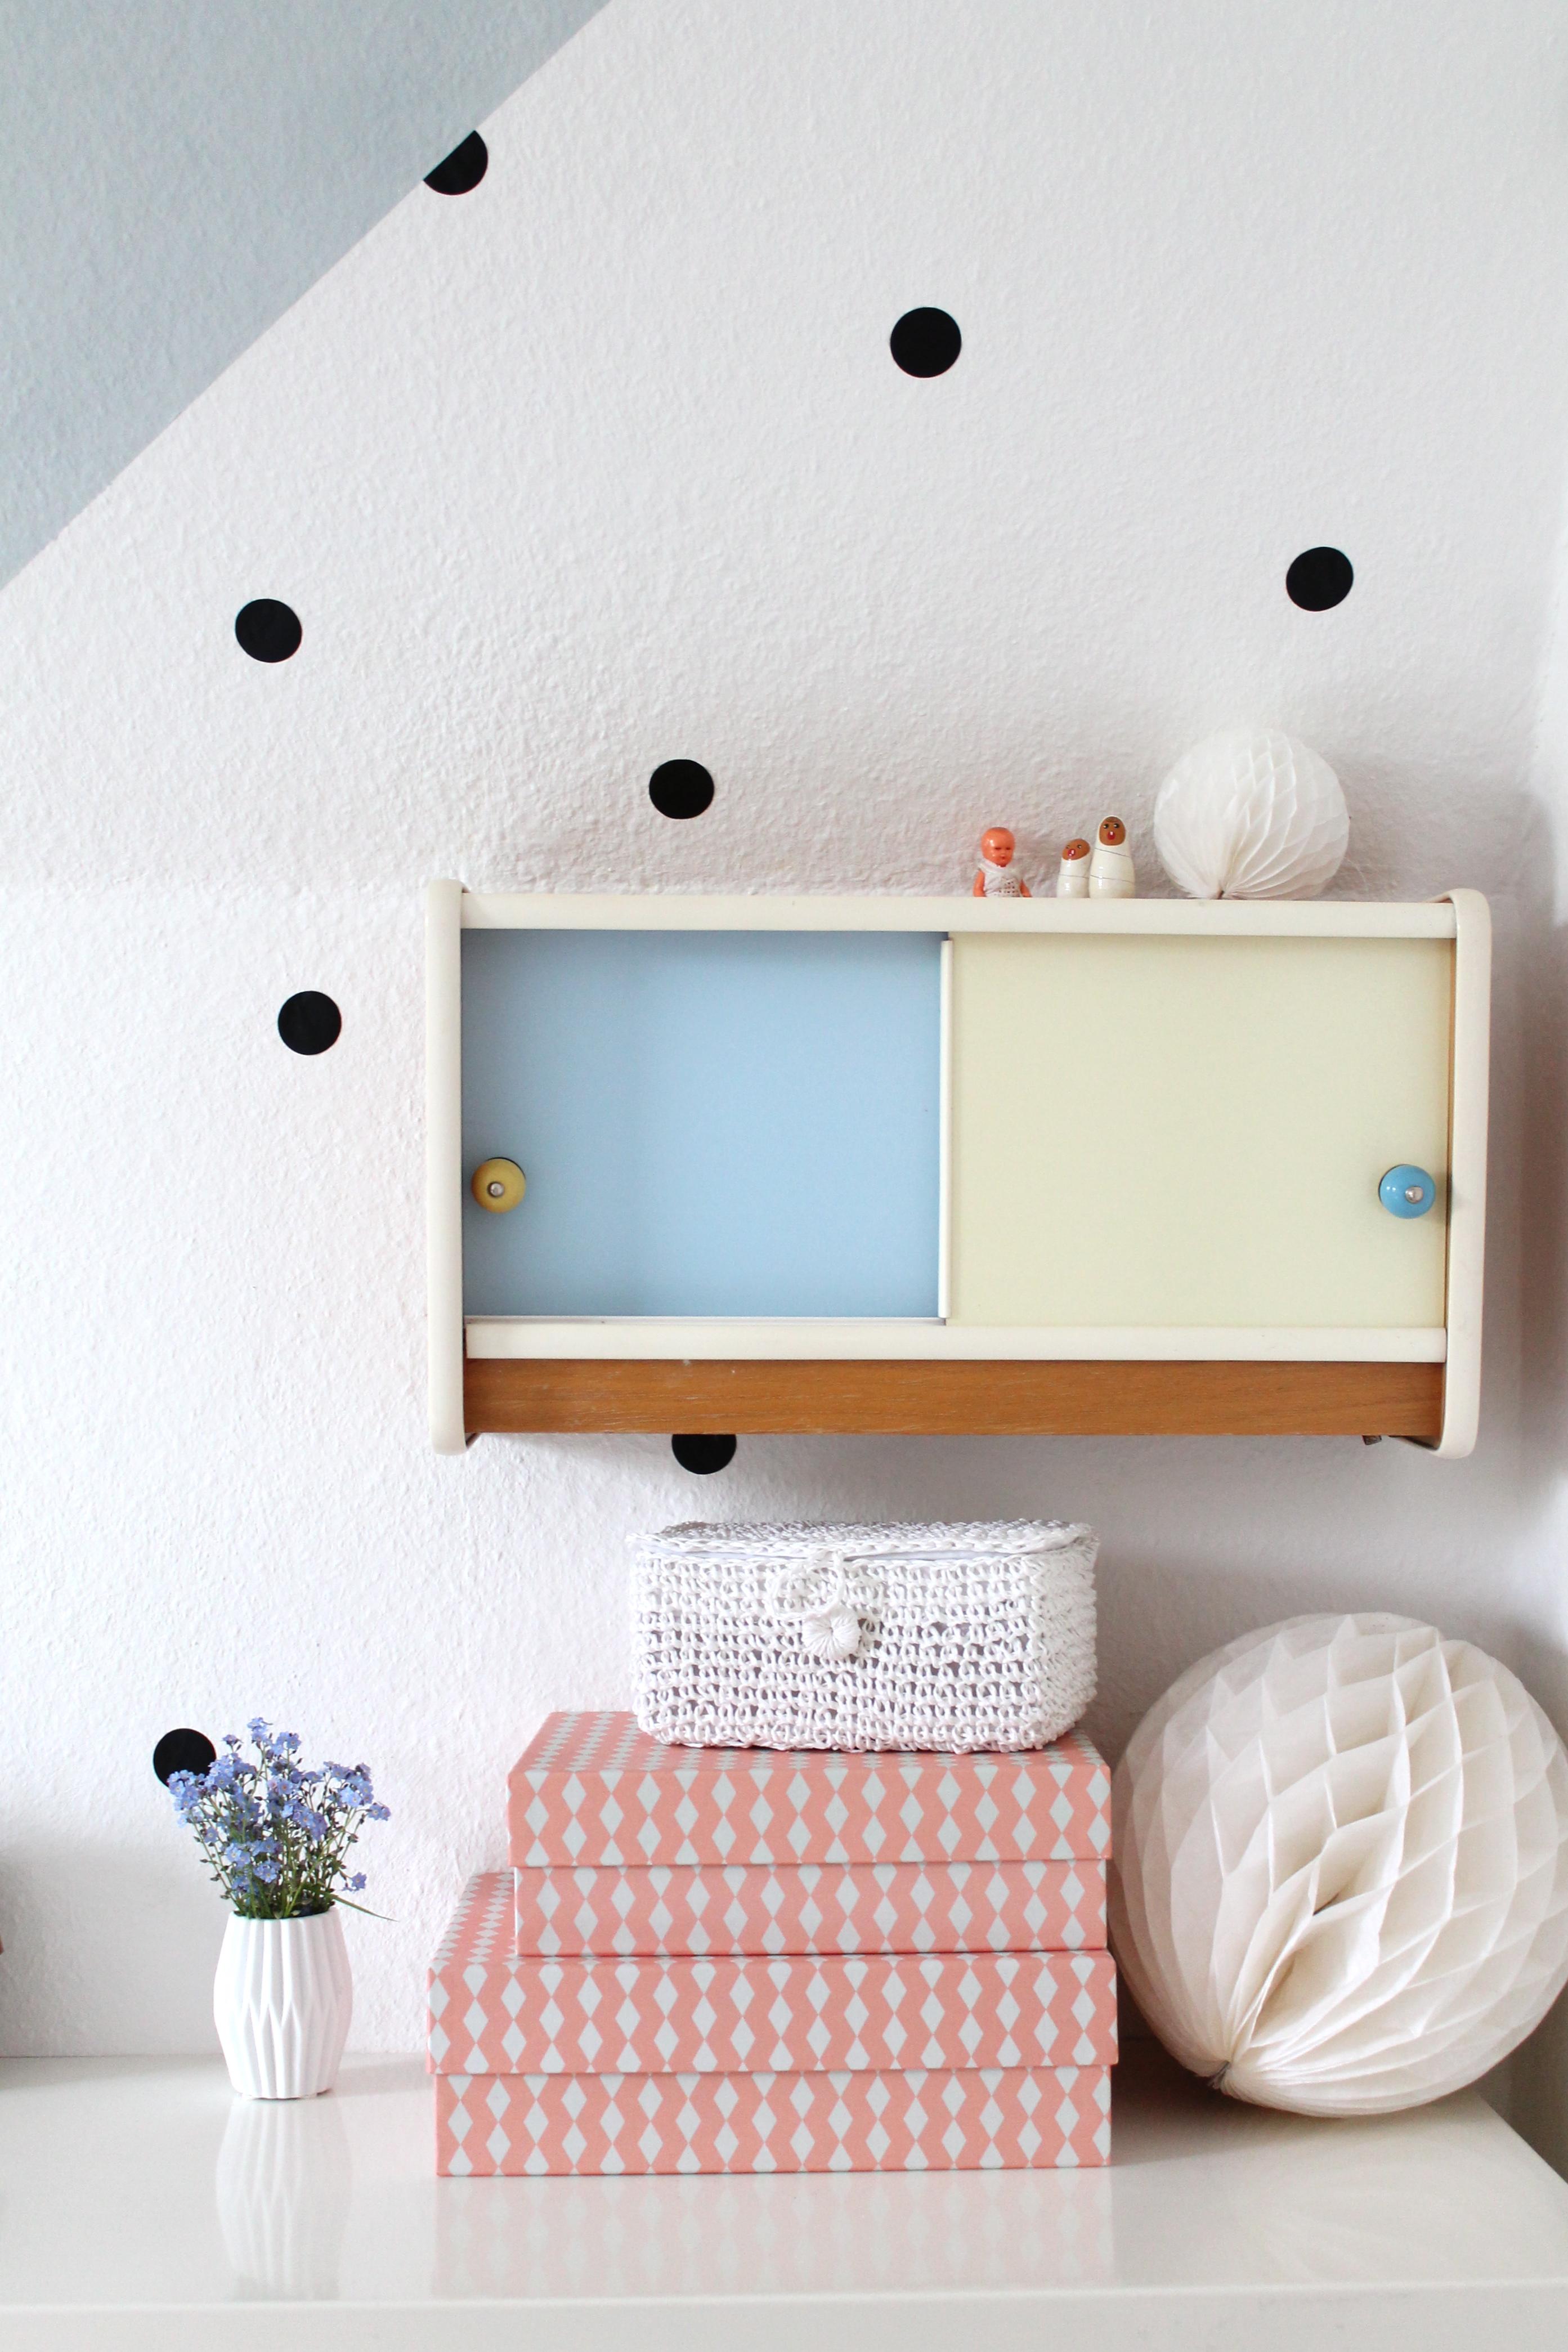 bloggers home britta gudd britta bloggt lilaliv. Black Bedroom Furniture Sets. Home Design Ideas